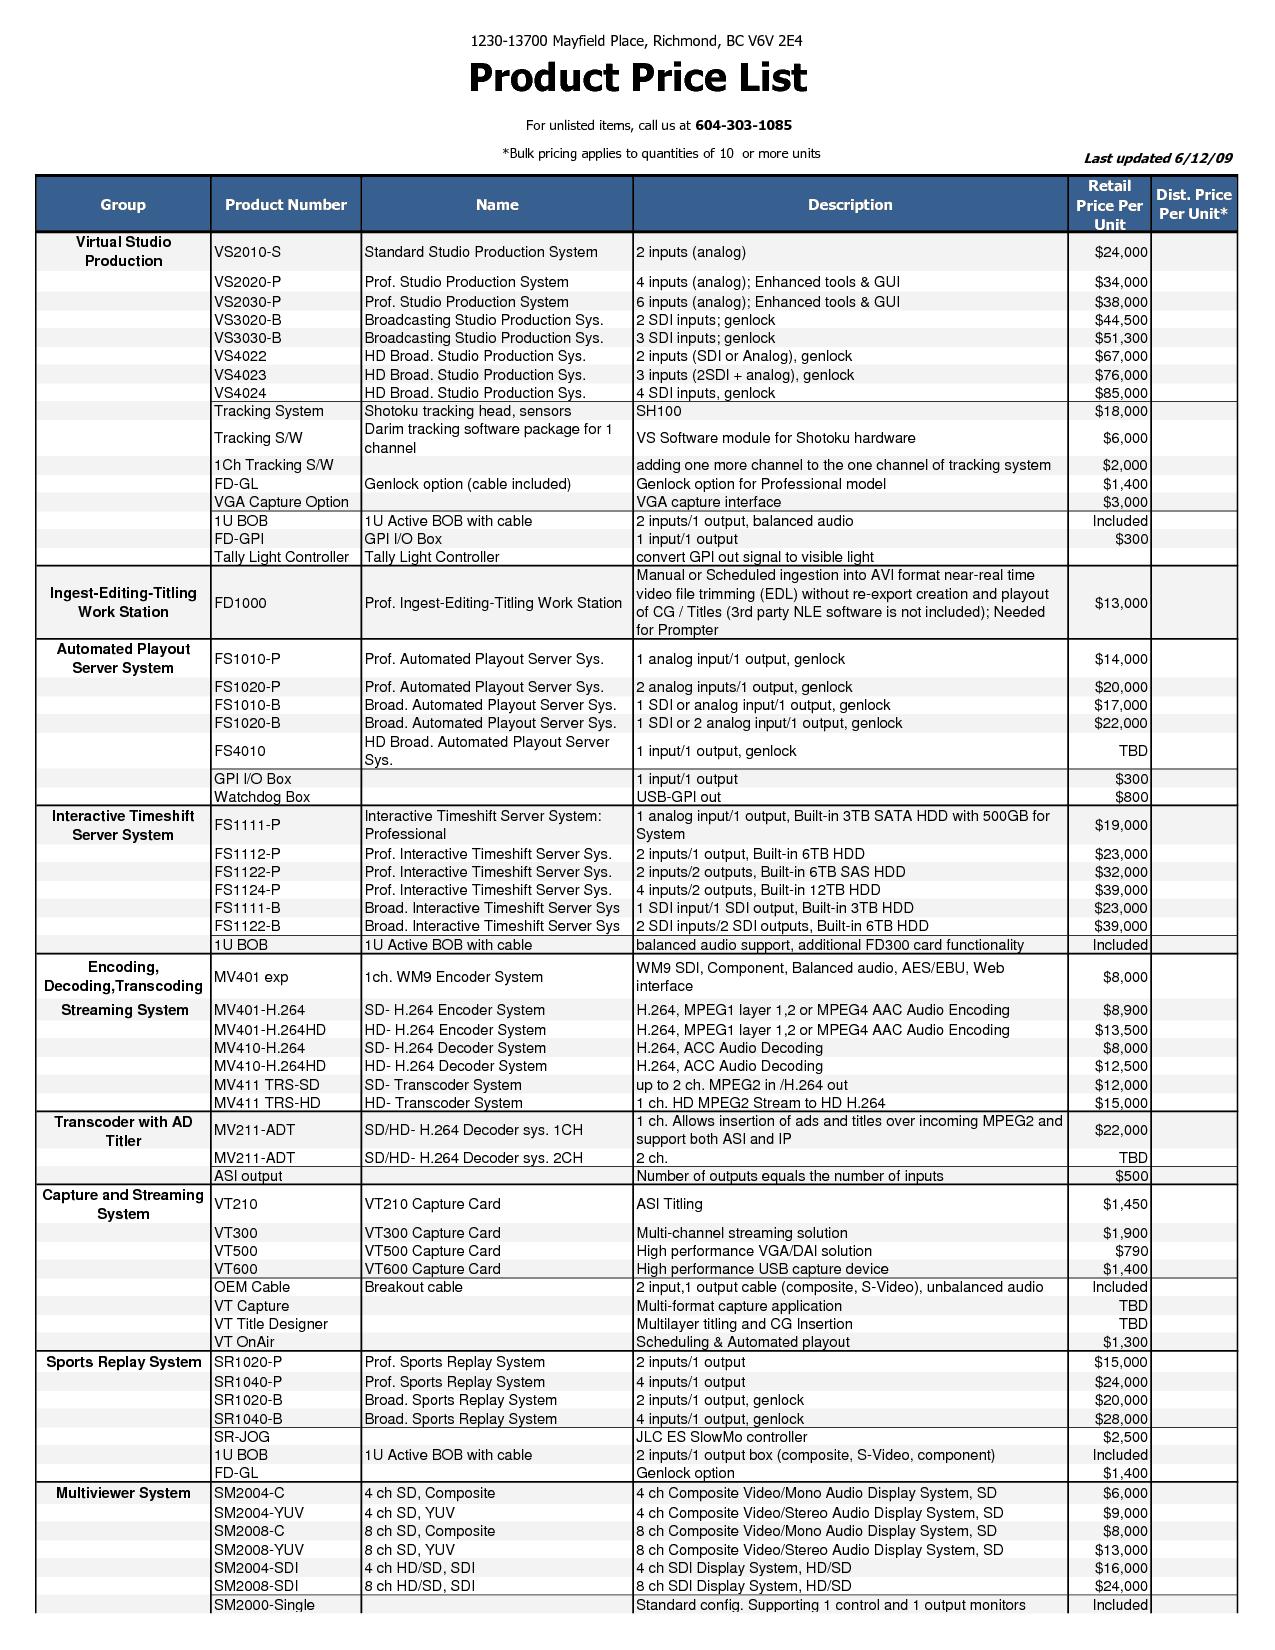 price list sample 14.641